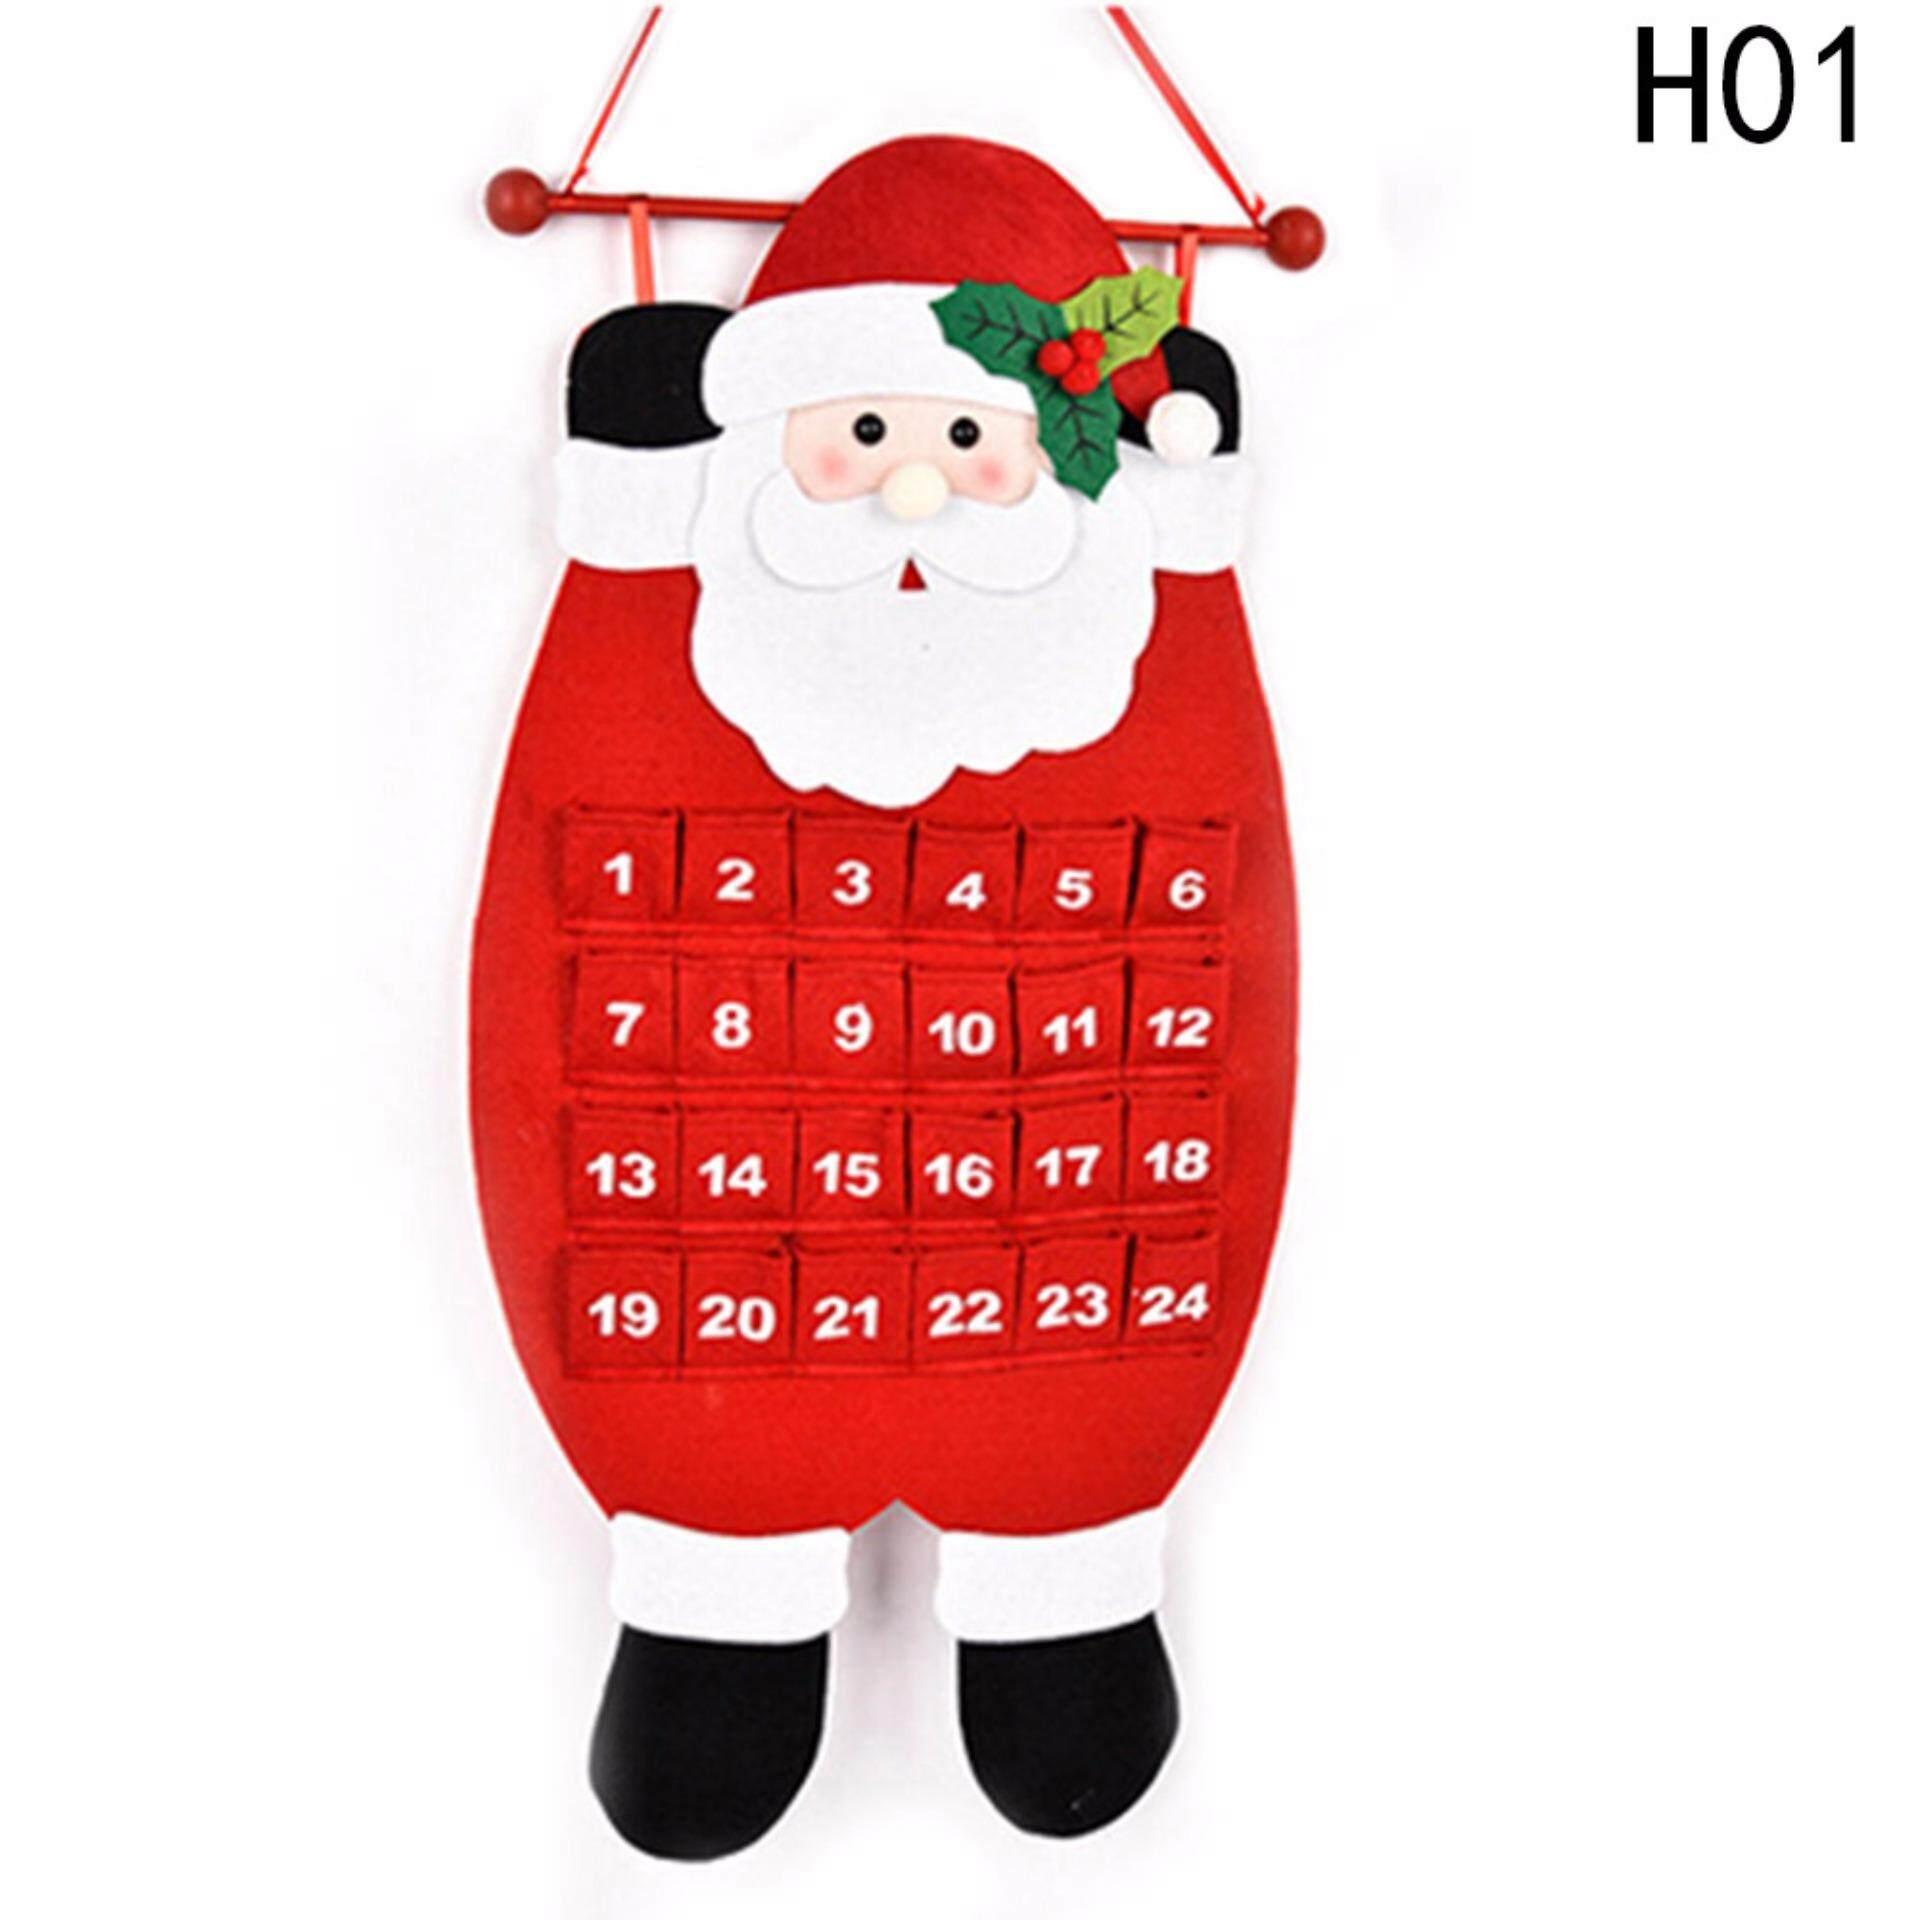 Fancyqube ปฏิทินคริสต์มาส Craft ซานตาคลอสมนุษย์หิมะตัวแขวนตกแต่ง H01 - Intl.